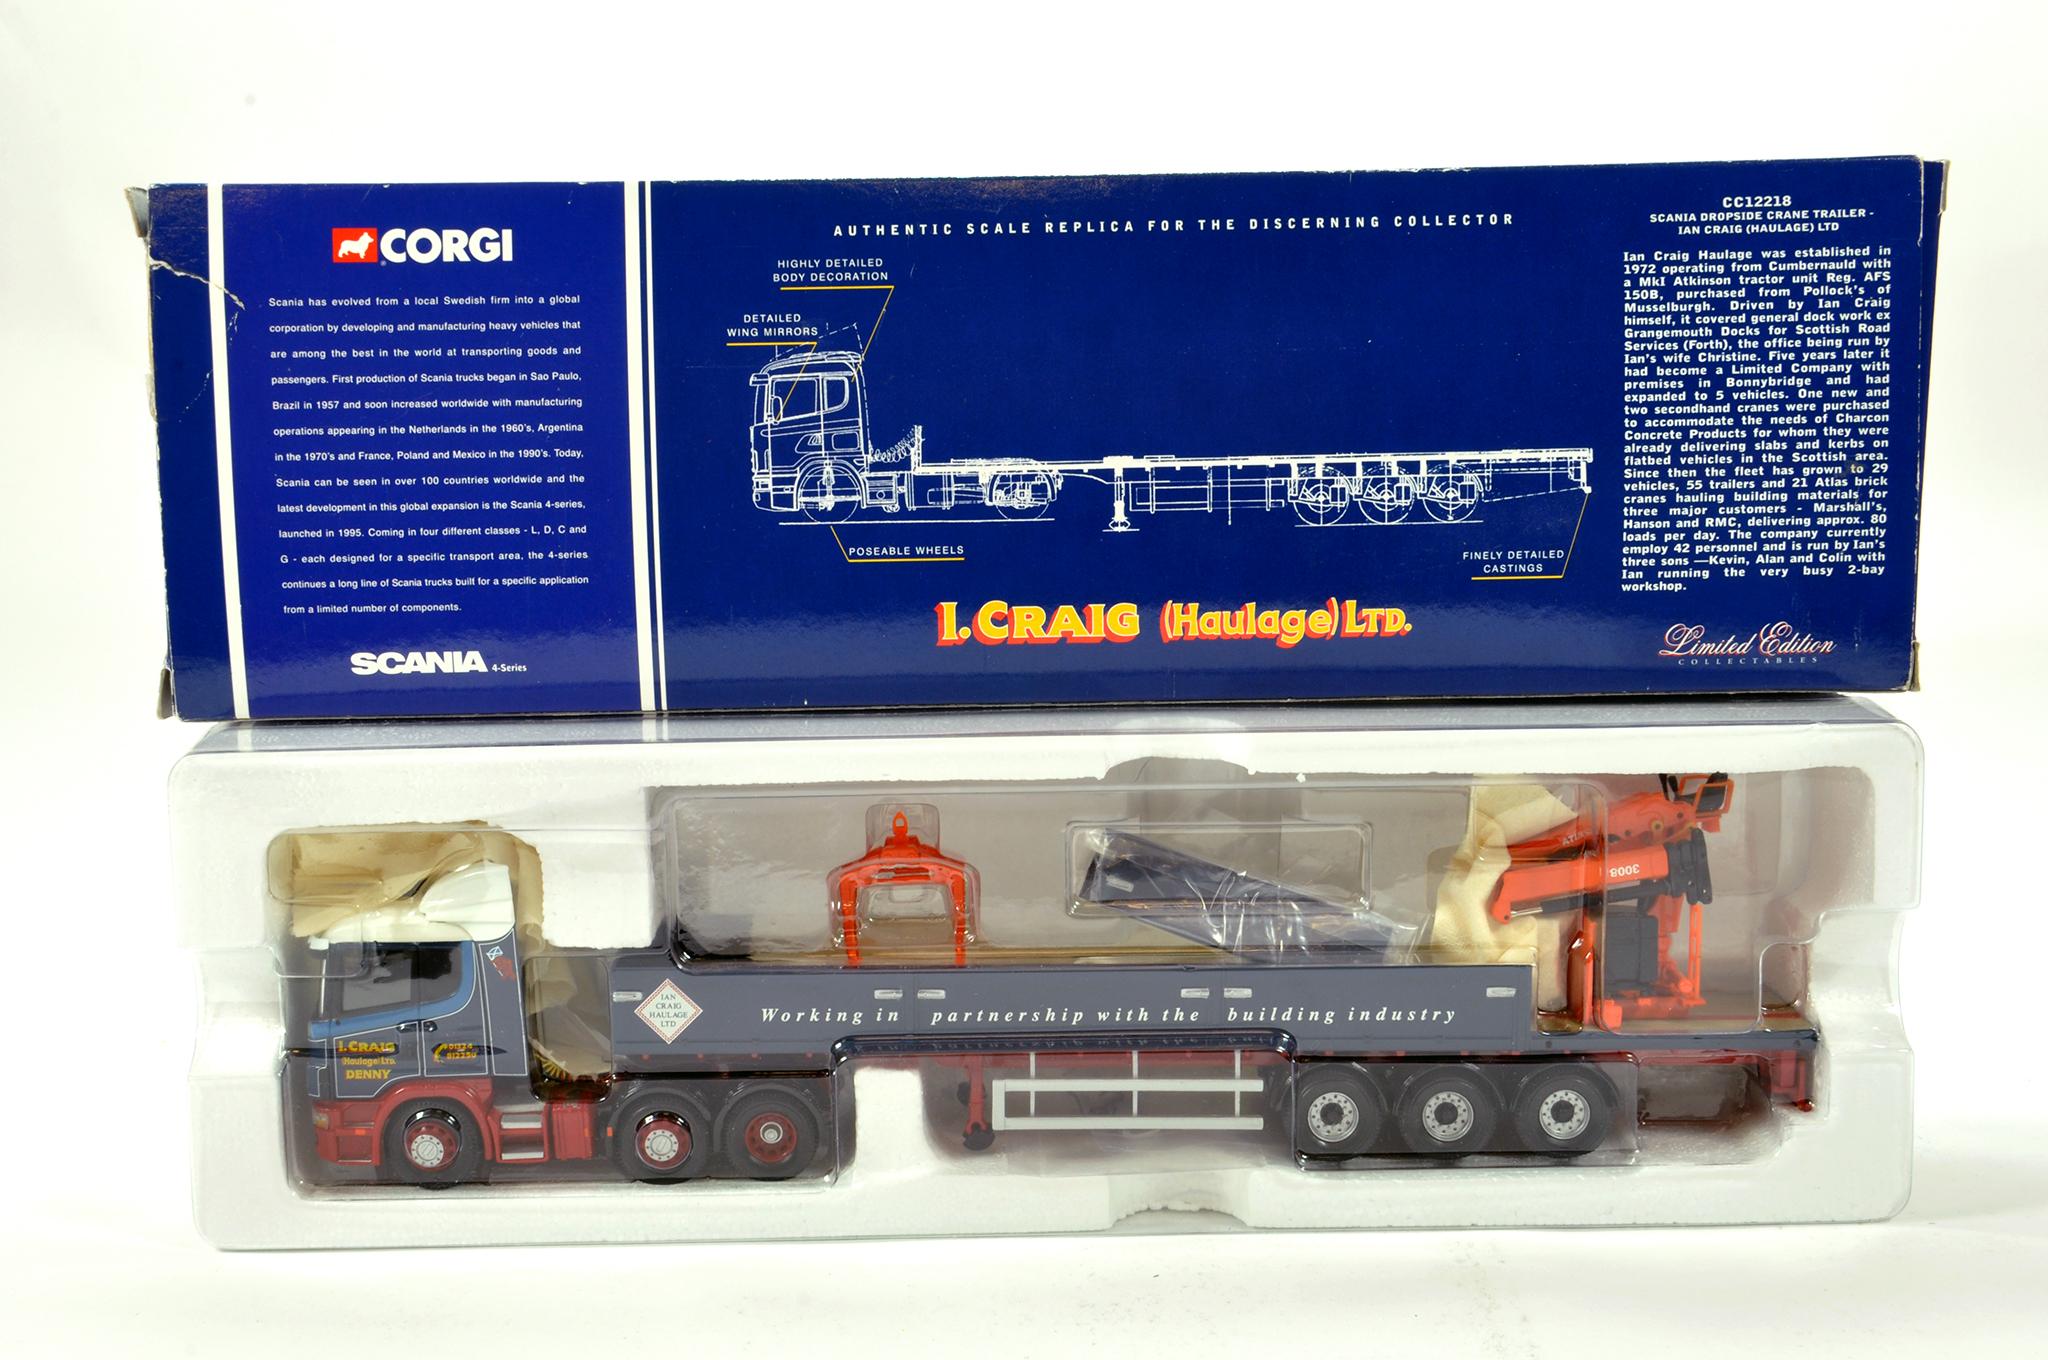 Lot 19 - Corgi 1/50 diecast truck issue comprising No. CC12218 Scania Dropside Crane Trailer in livery of Ian